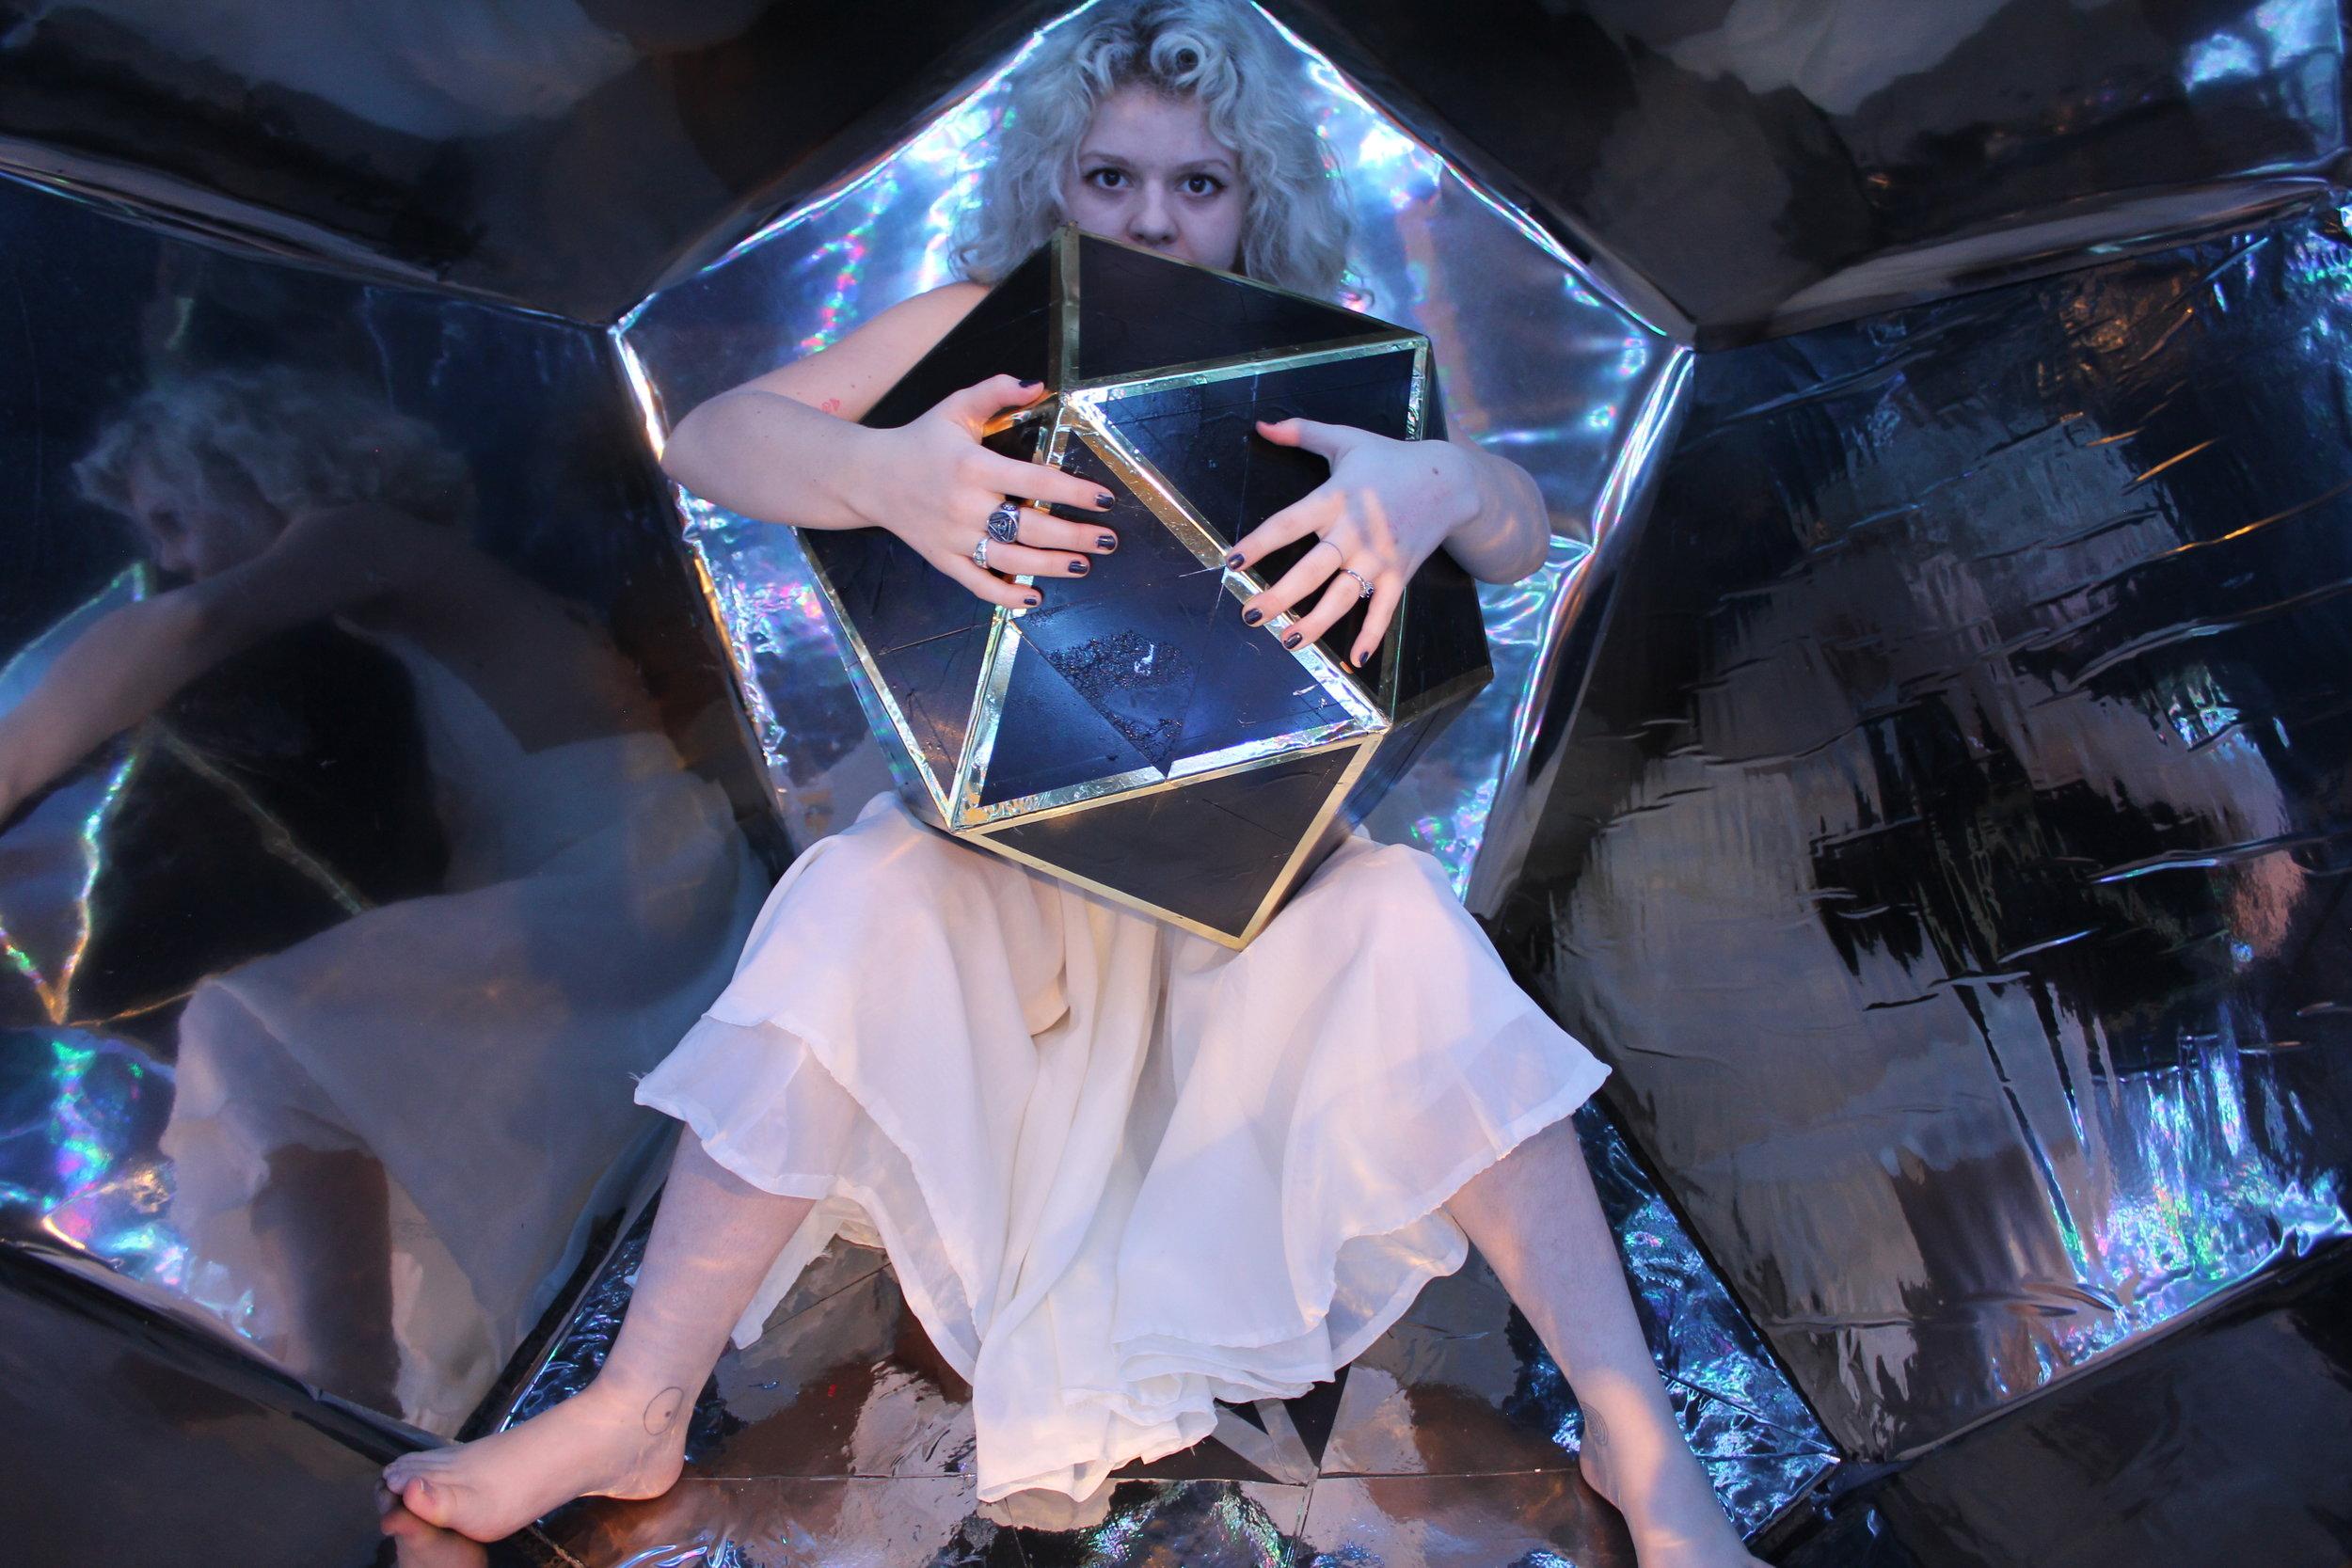 08_Dual_Polyhedra_Pt.2.JPG